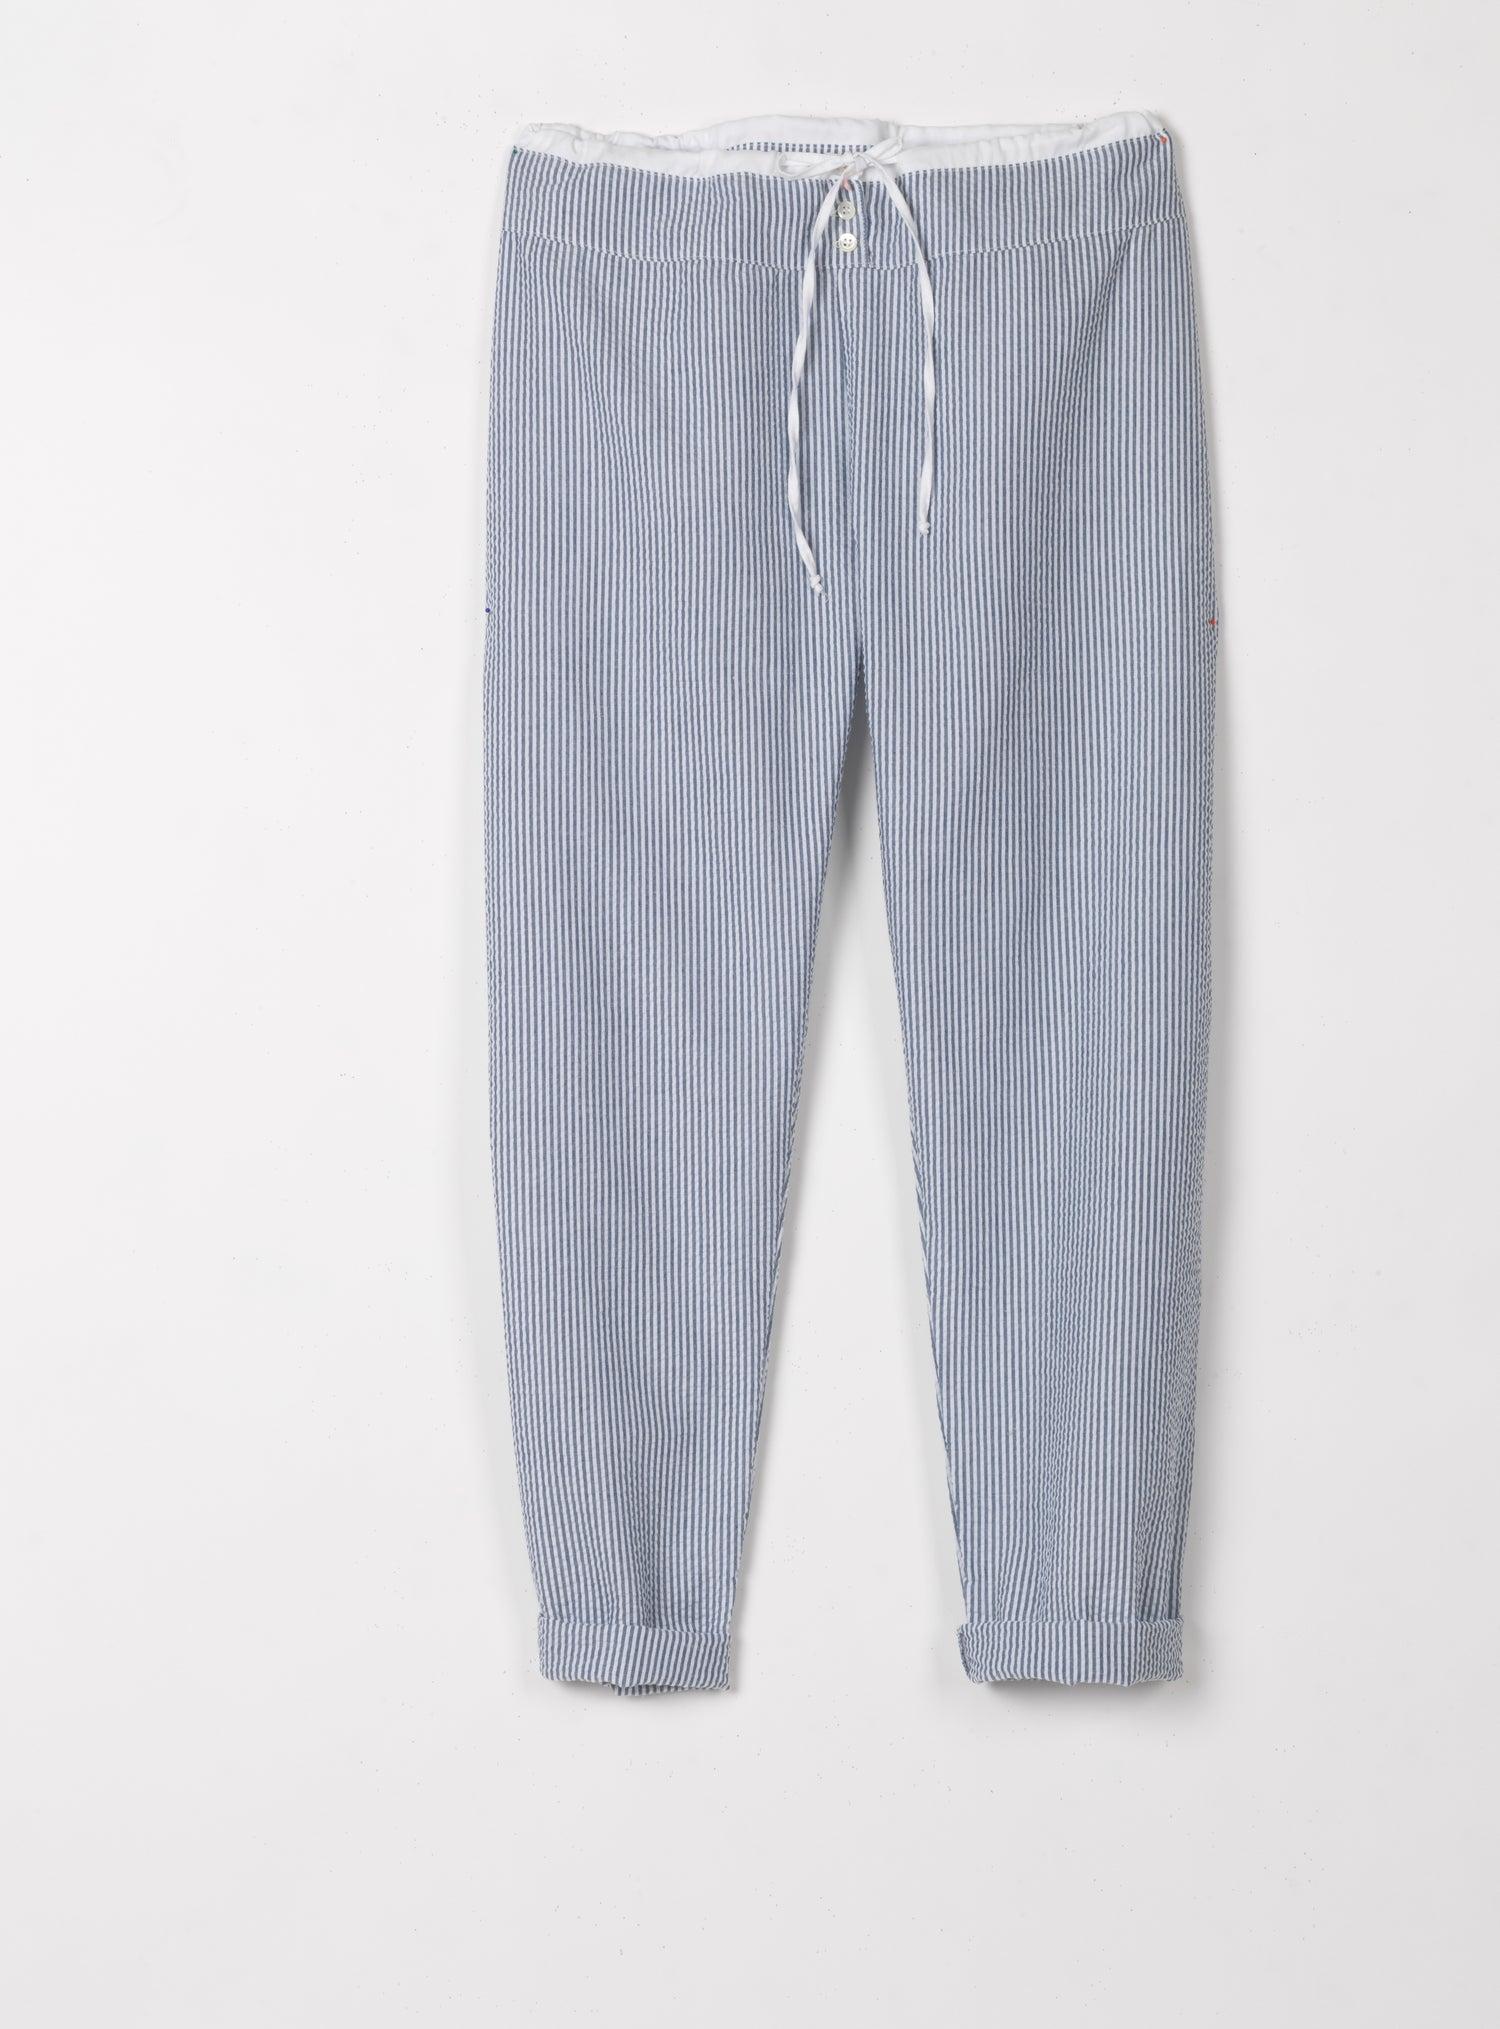 Image of Pantalon FRAISE